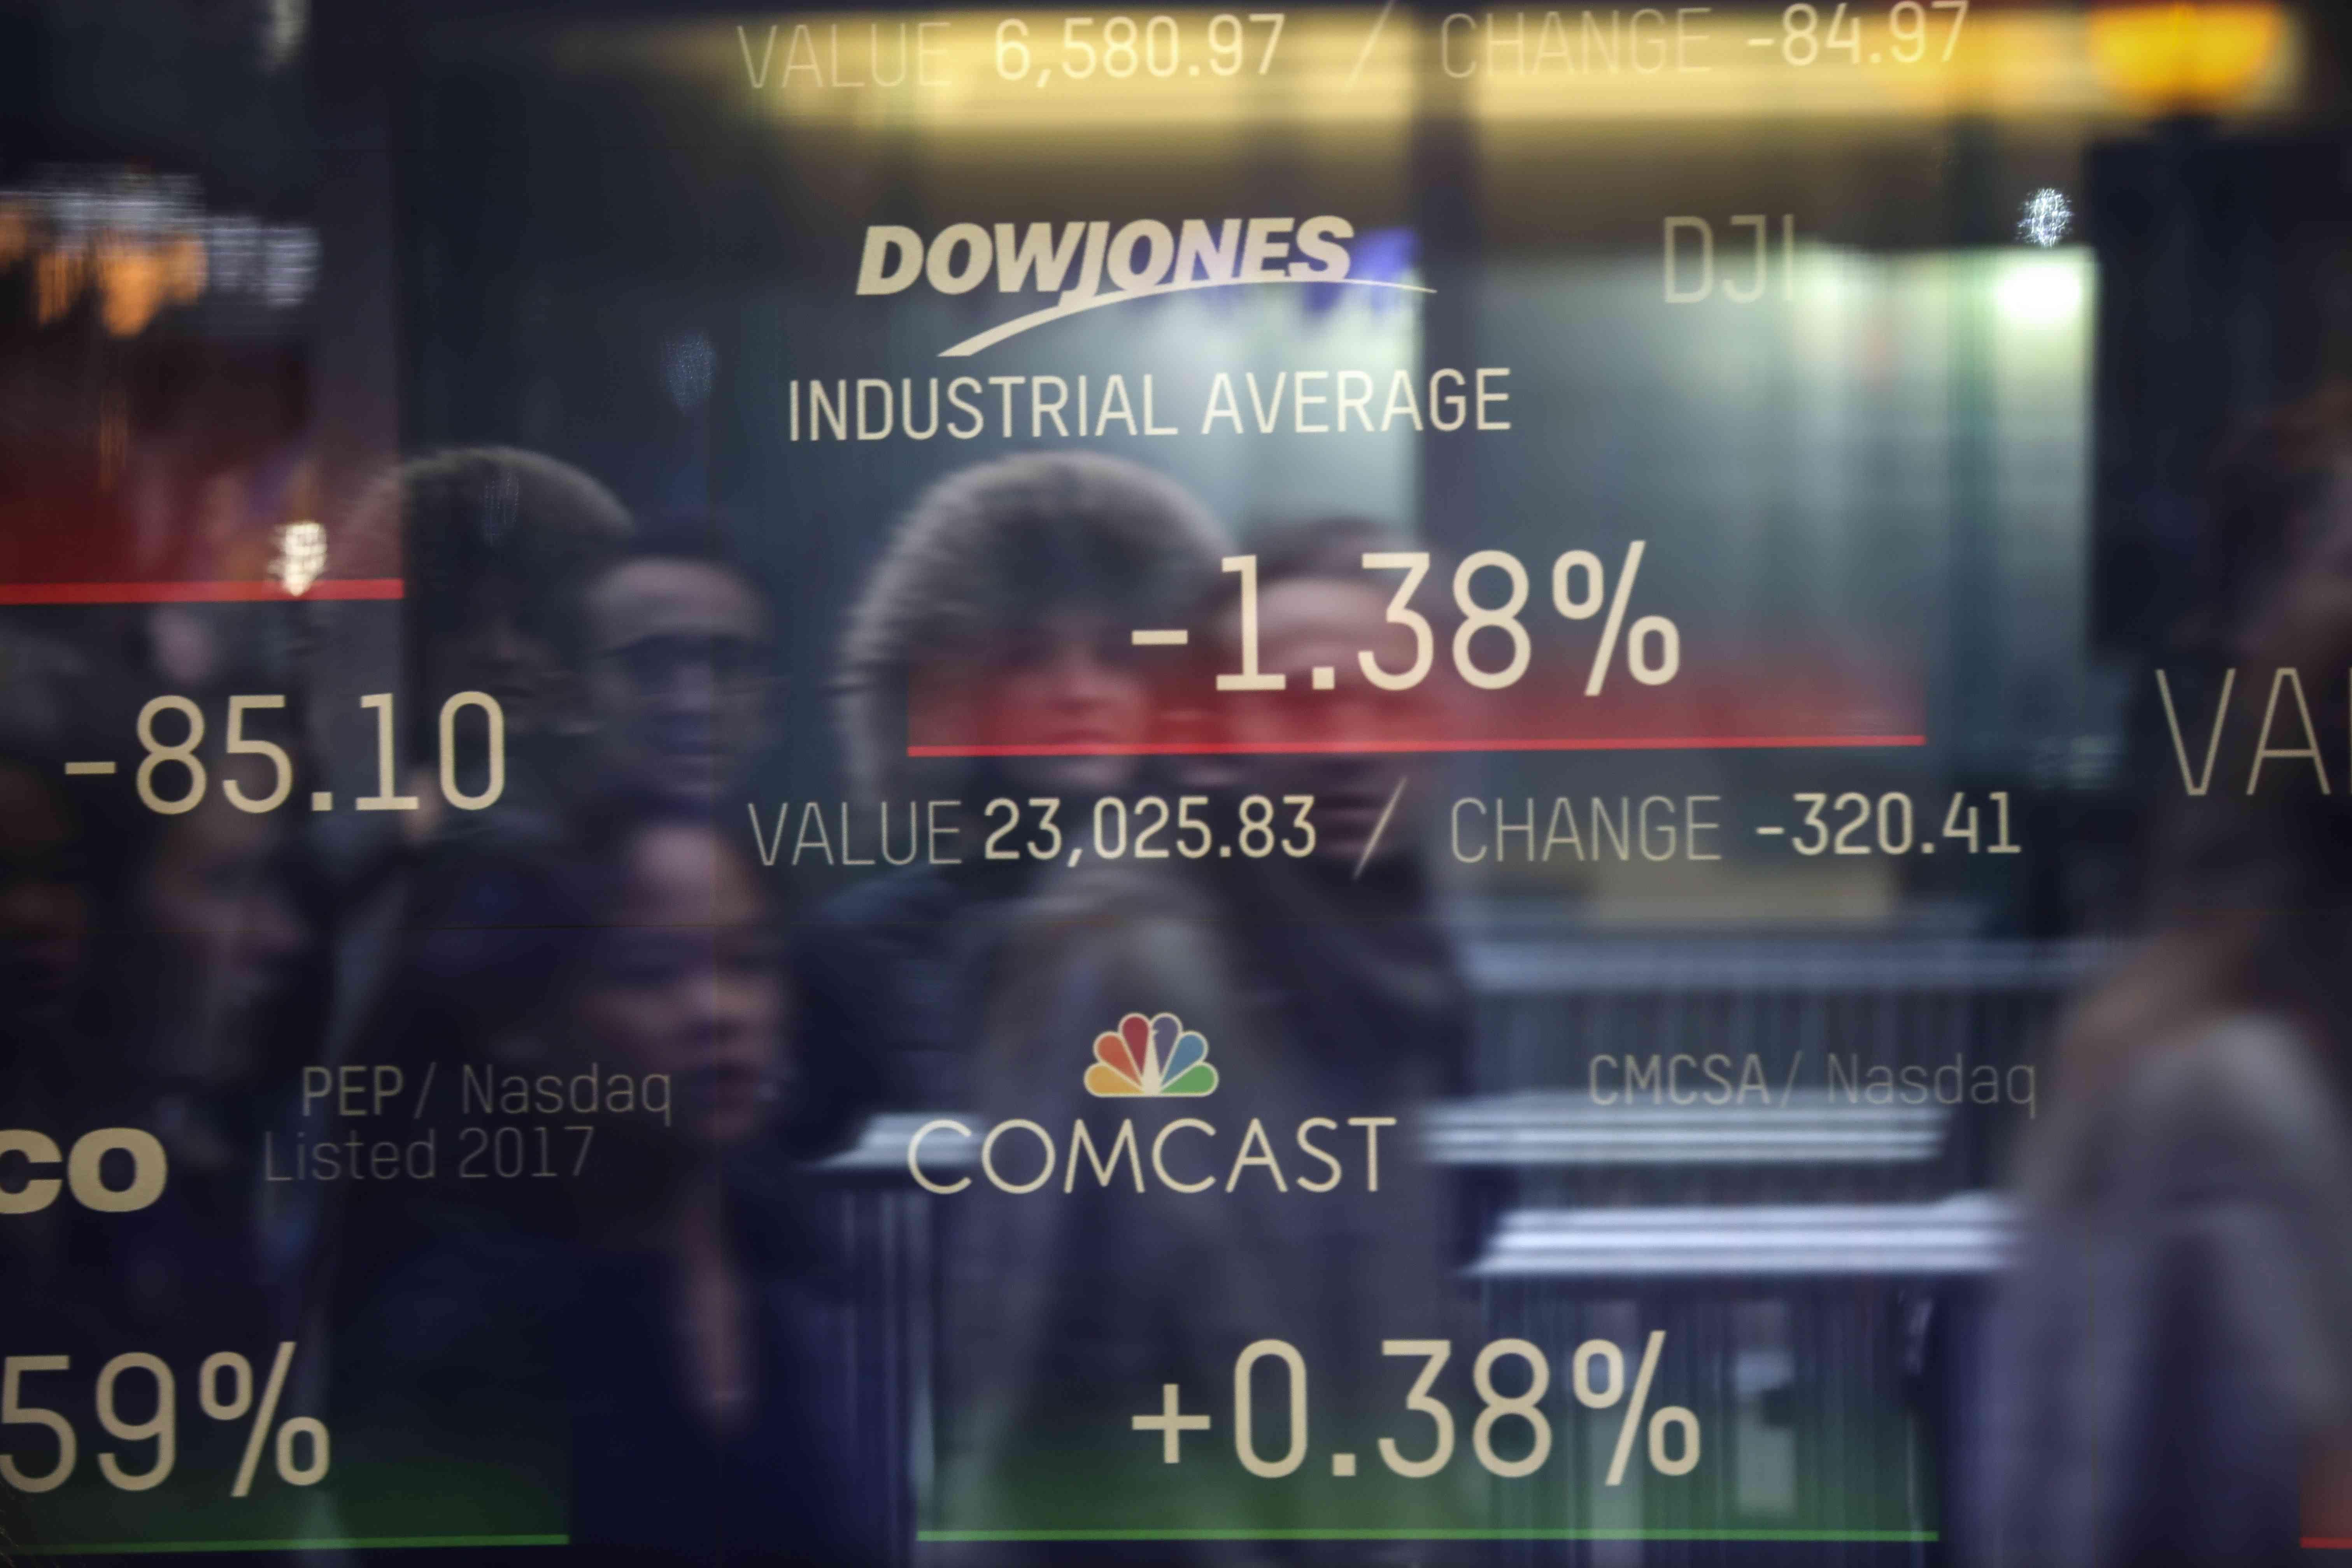 Who were the original Dow Jones Industrial Average (DJIA